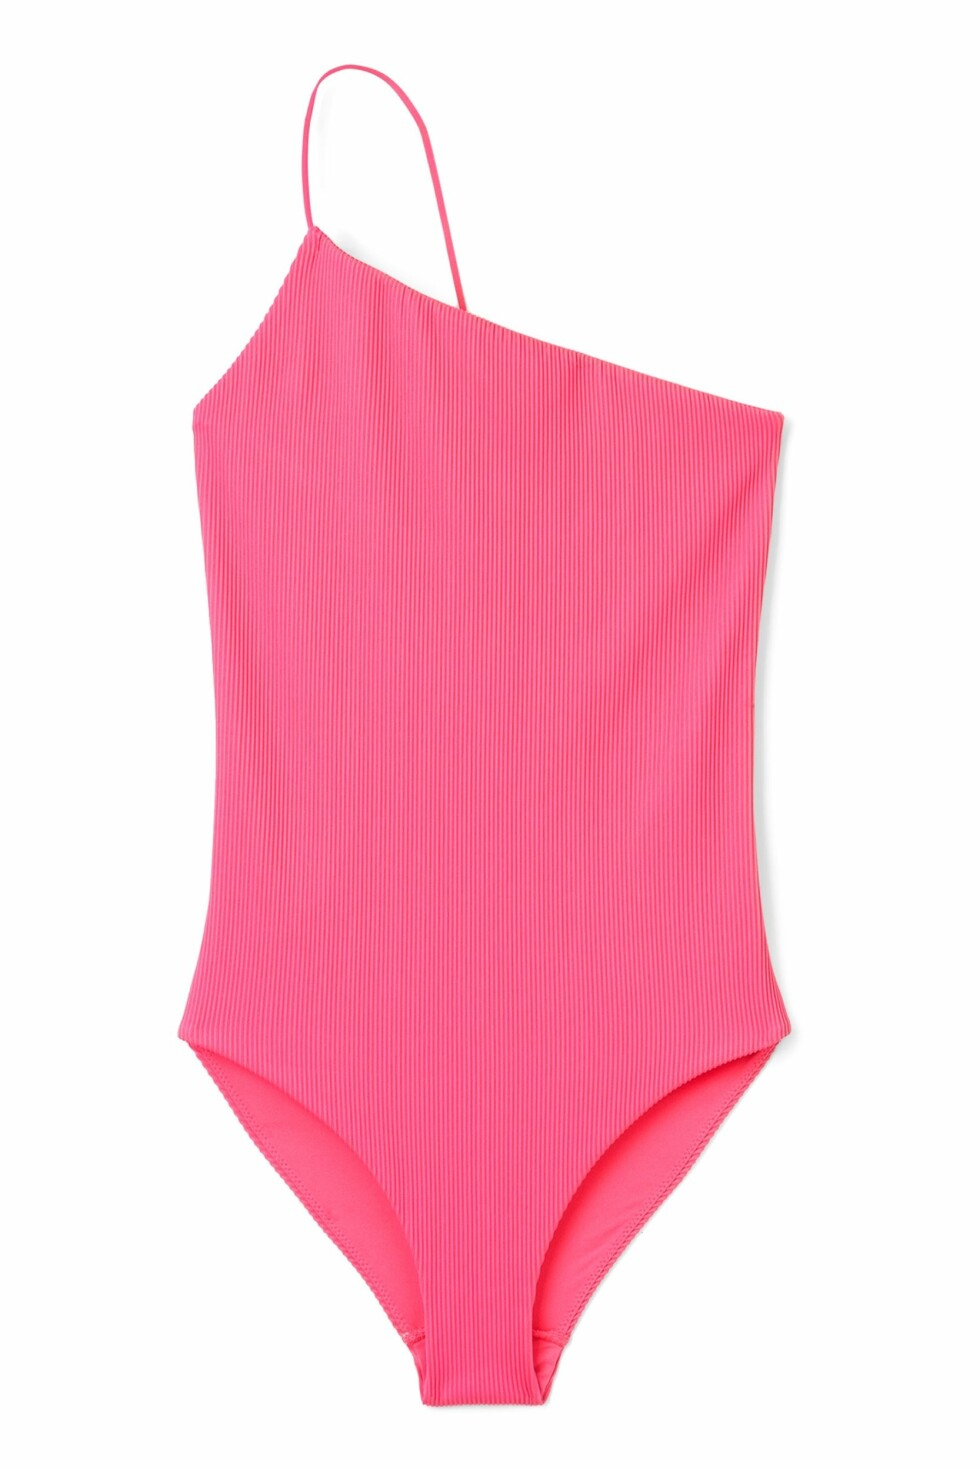 Badedrakt fra Weekday | kr 115 | http://shop.weekday.com/nl/Womens_shop/Sale/All/Nola_Swimsuit/5453574-11581401.1?image=1328240#c-47958